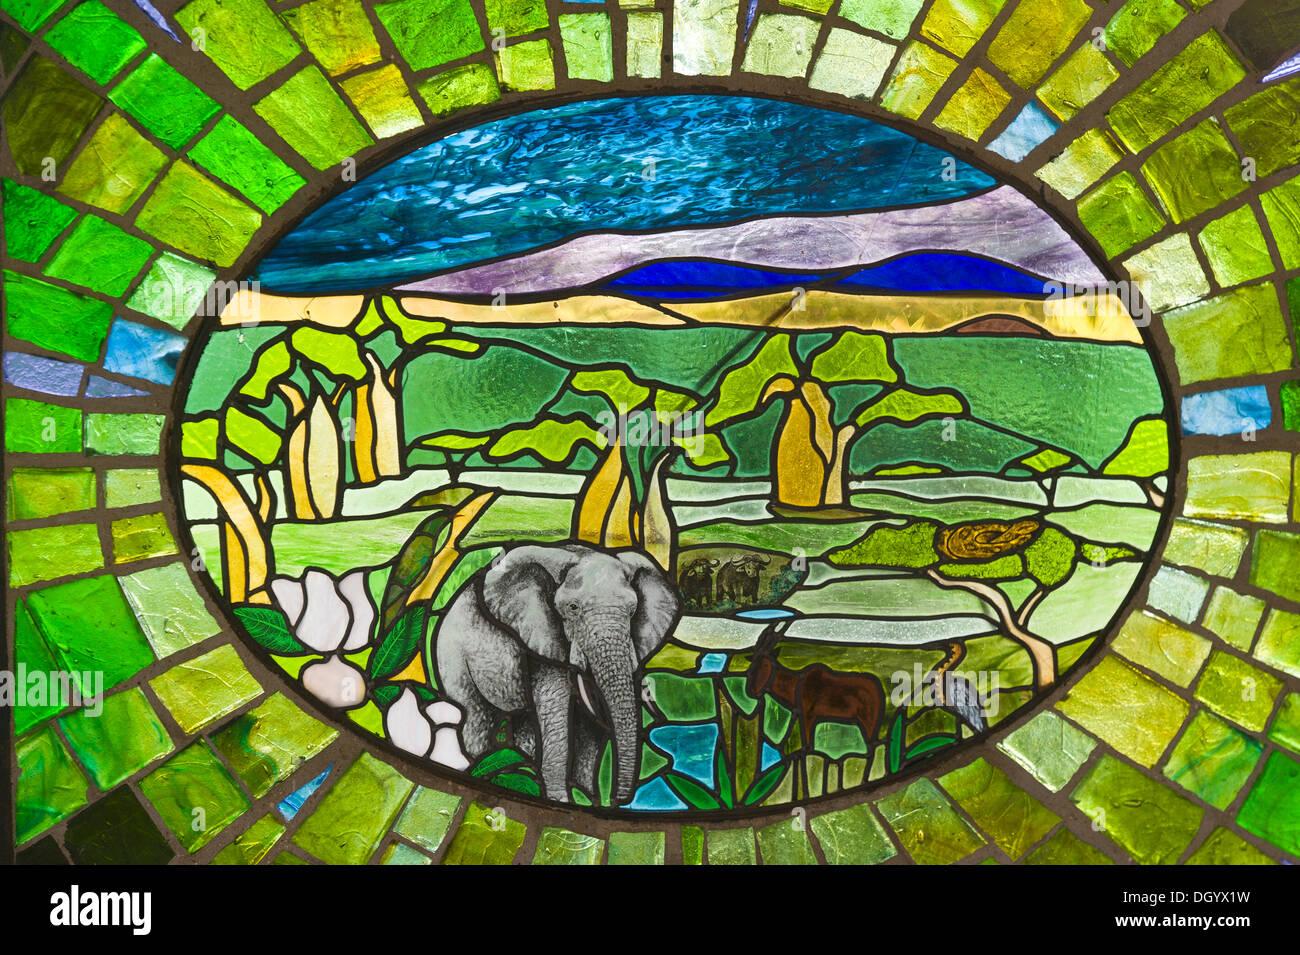 Tiffany glass showing landscape and African elephant (Loxodonta africana) in Tarangire National Park, Tanzania - Stock Image